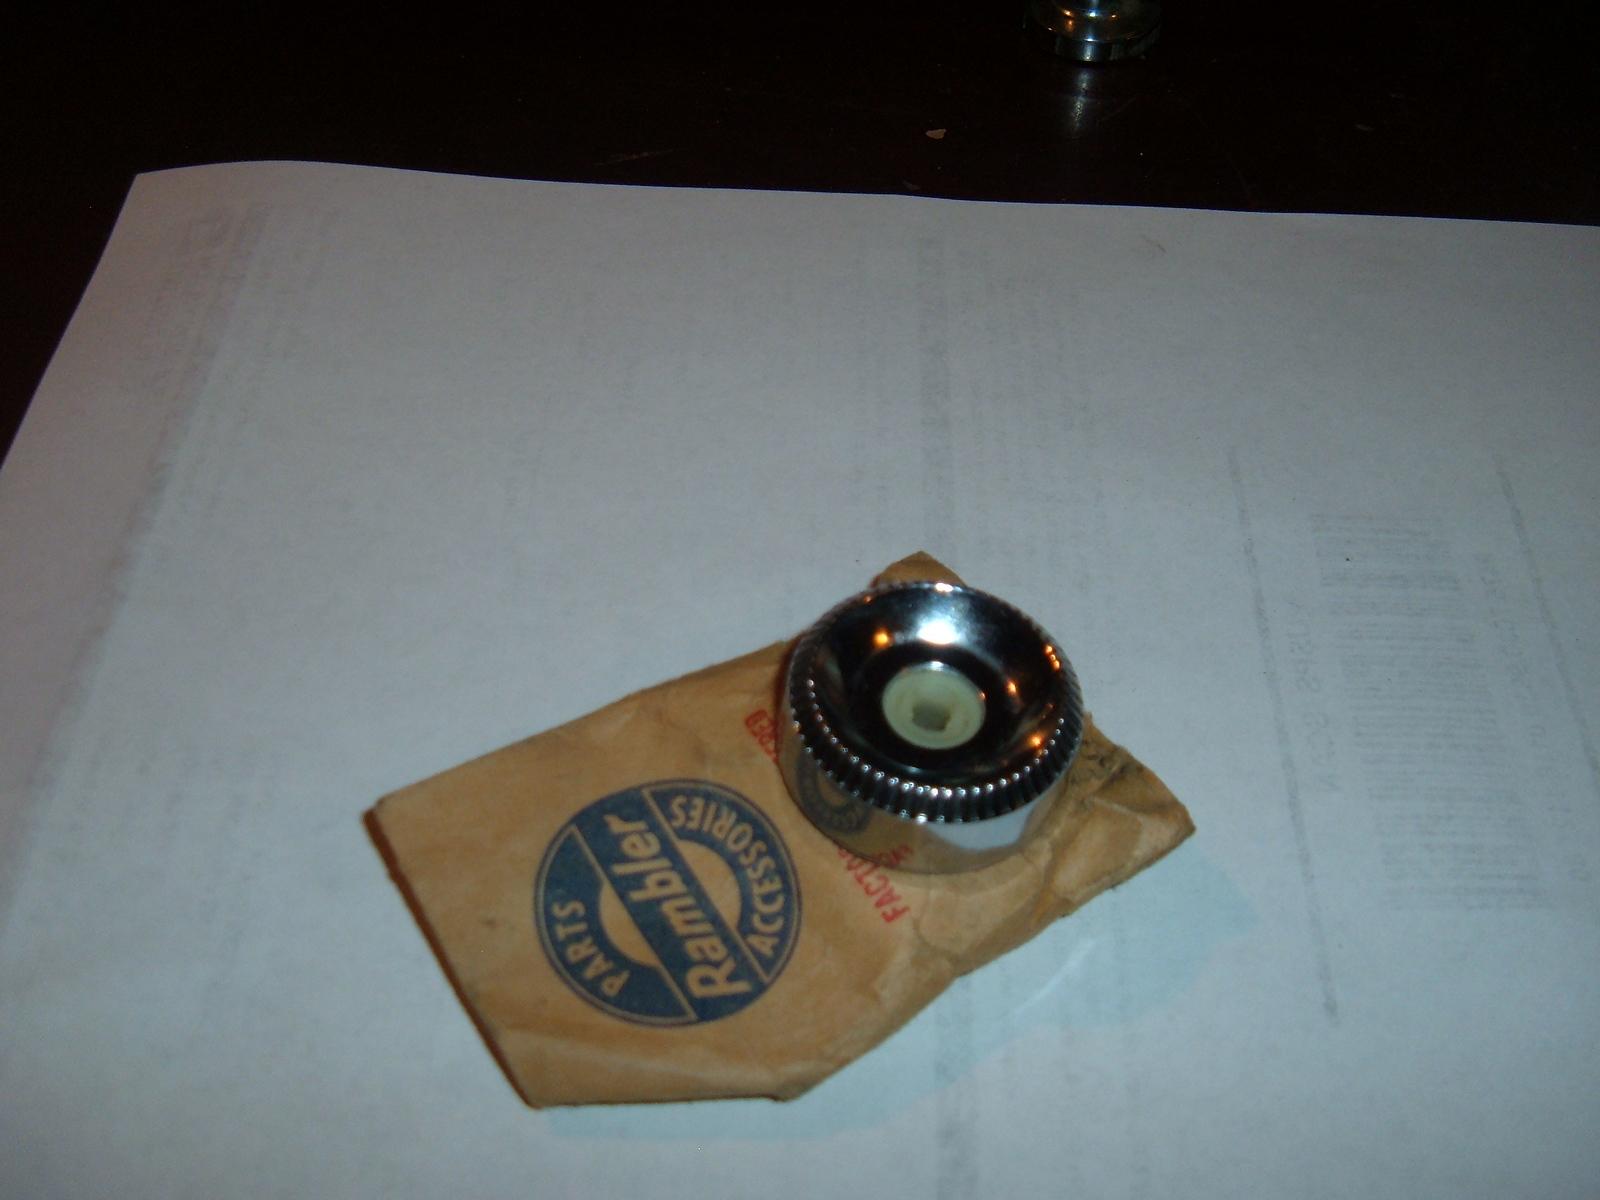 1964 65 rambler classic american marlin station selector speaker knob nos # 3500747 (z 3500747)